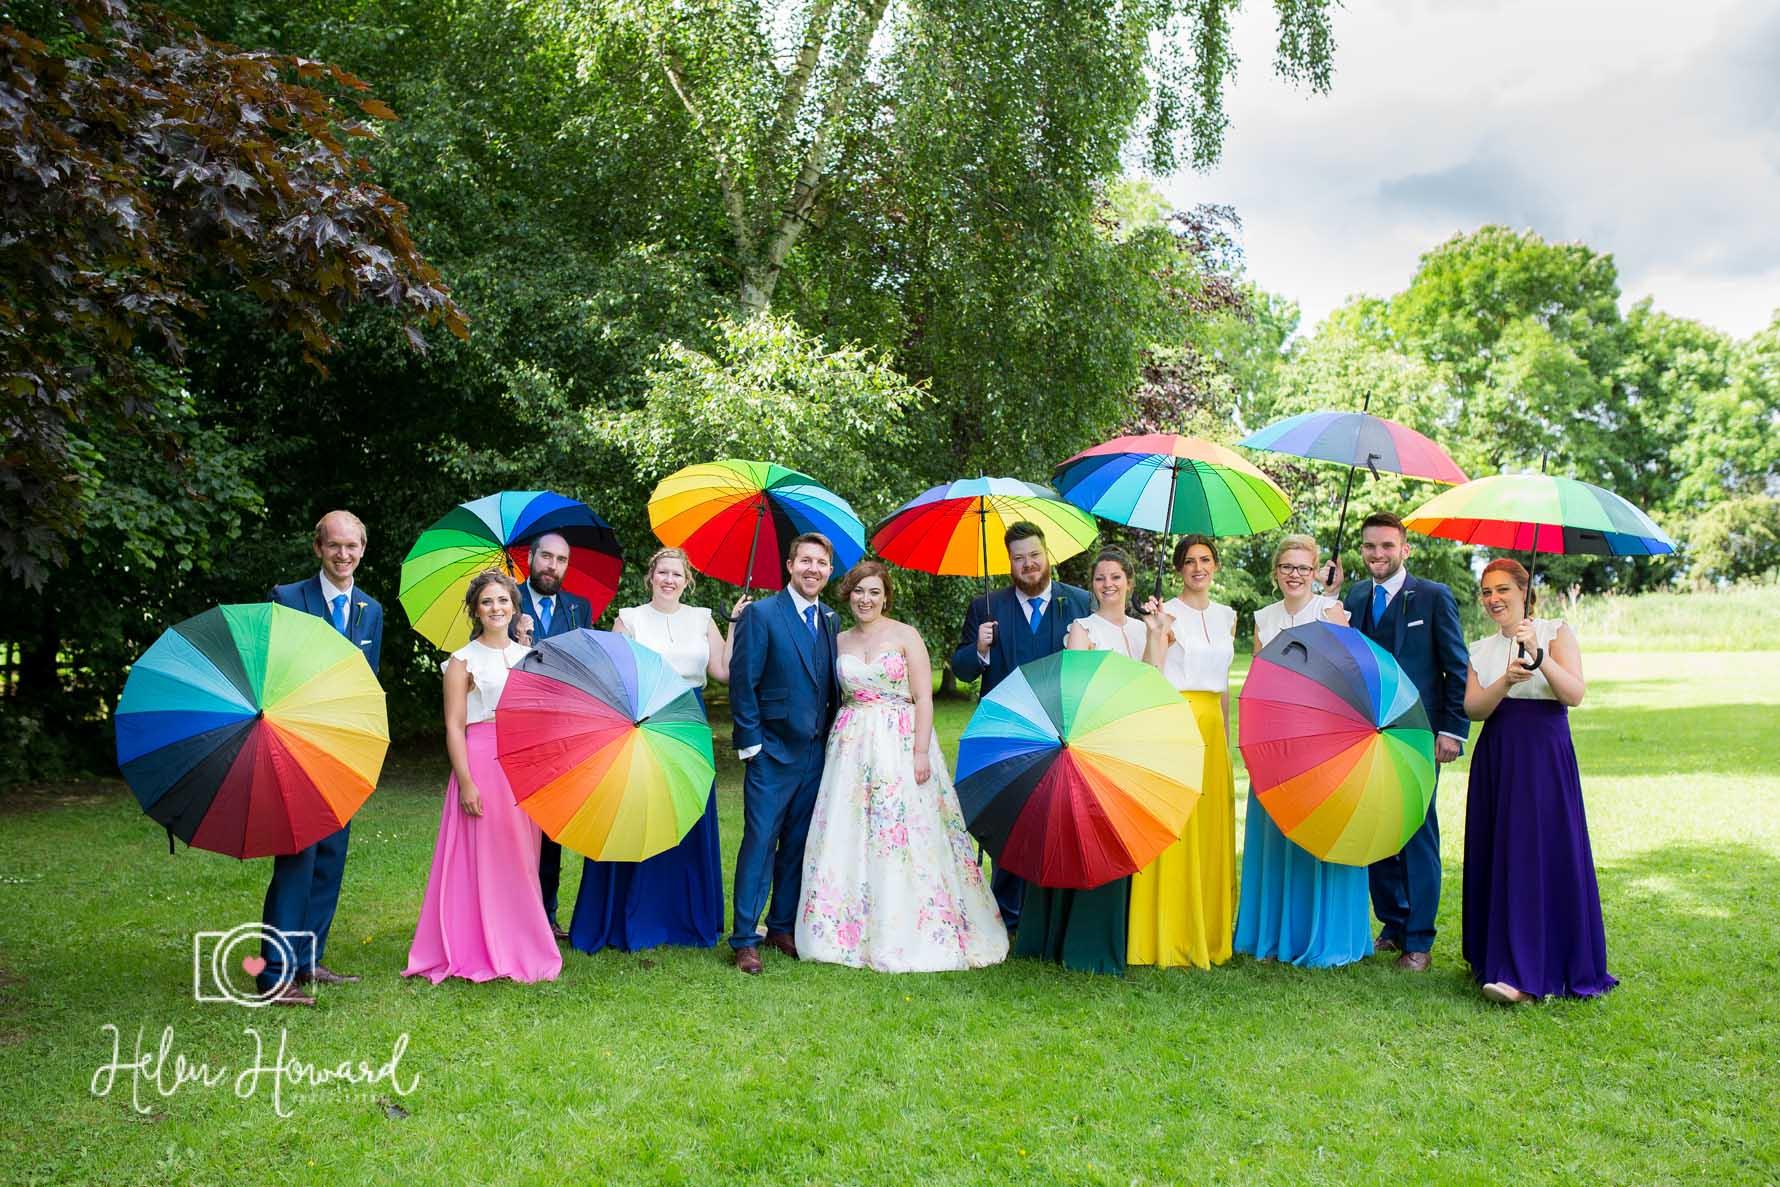 Wedding party and rainbow umbrellas